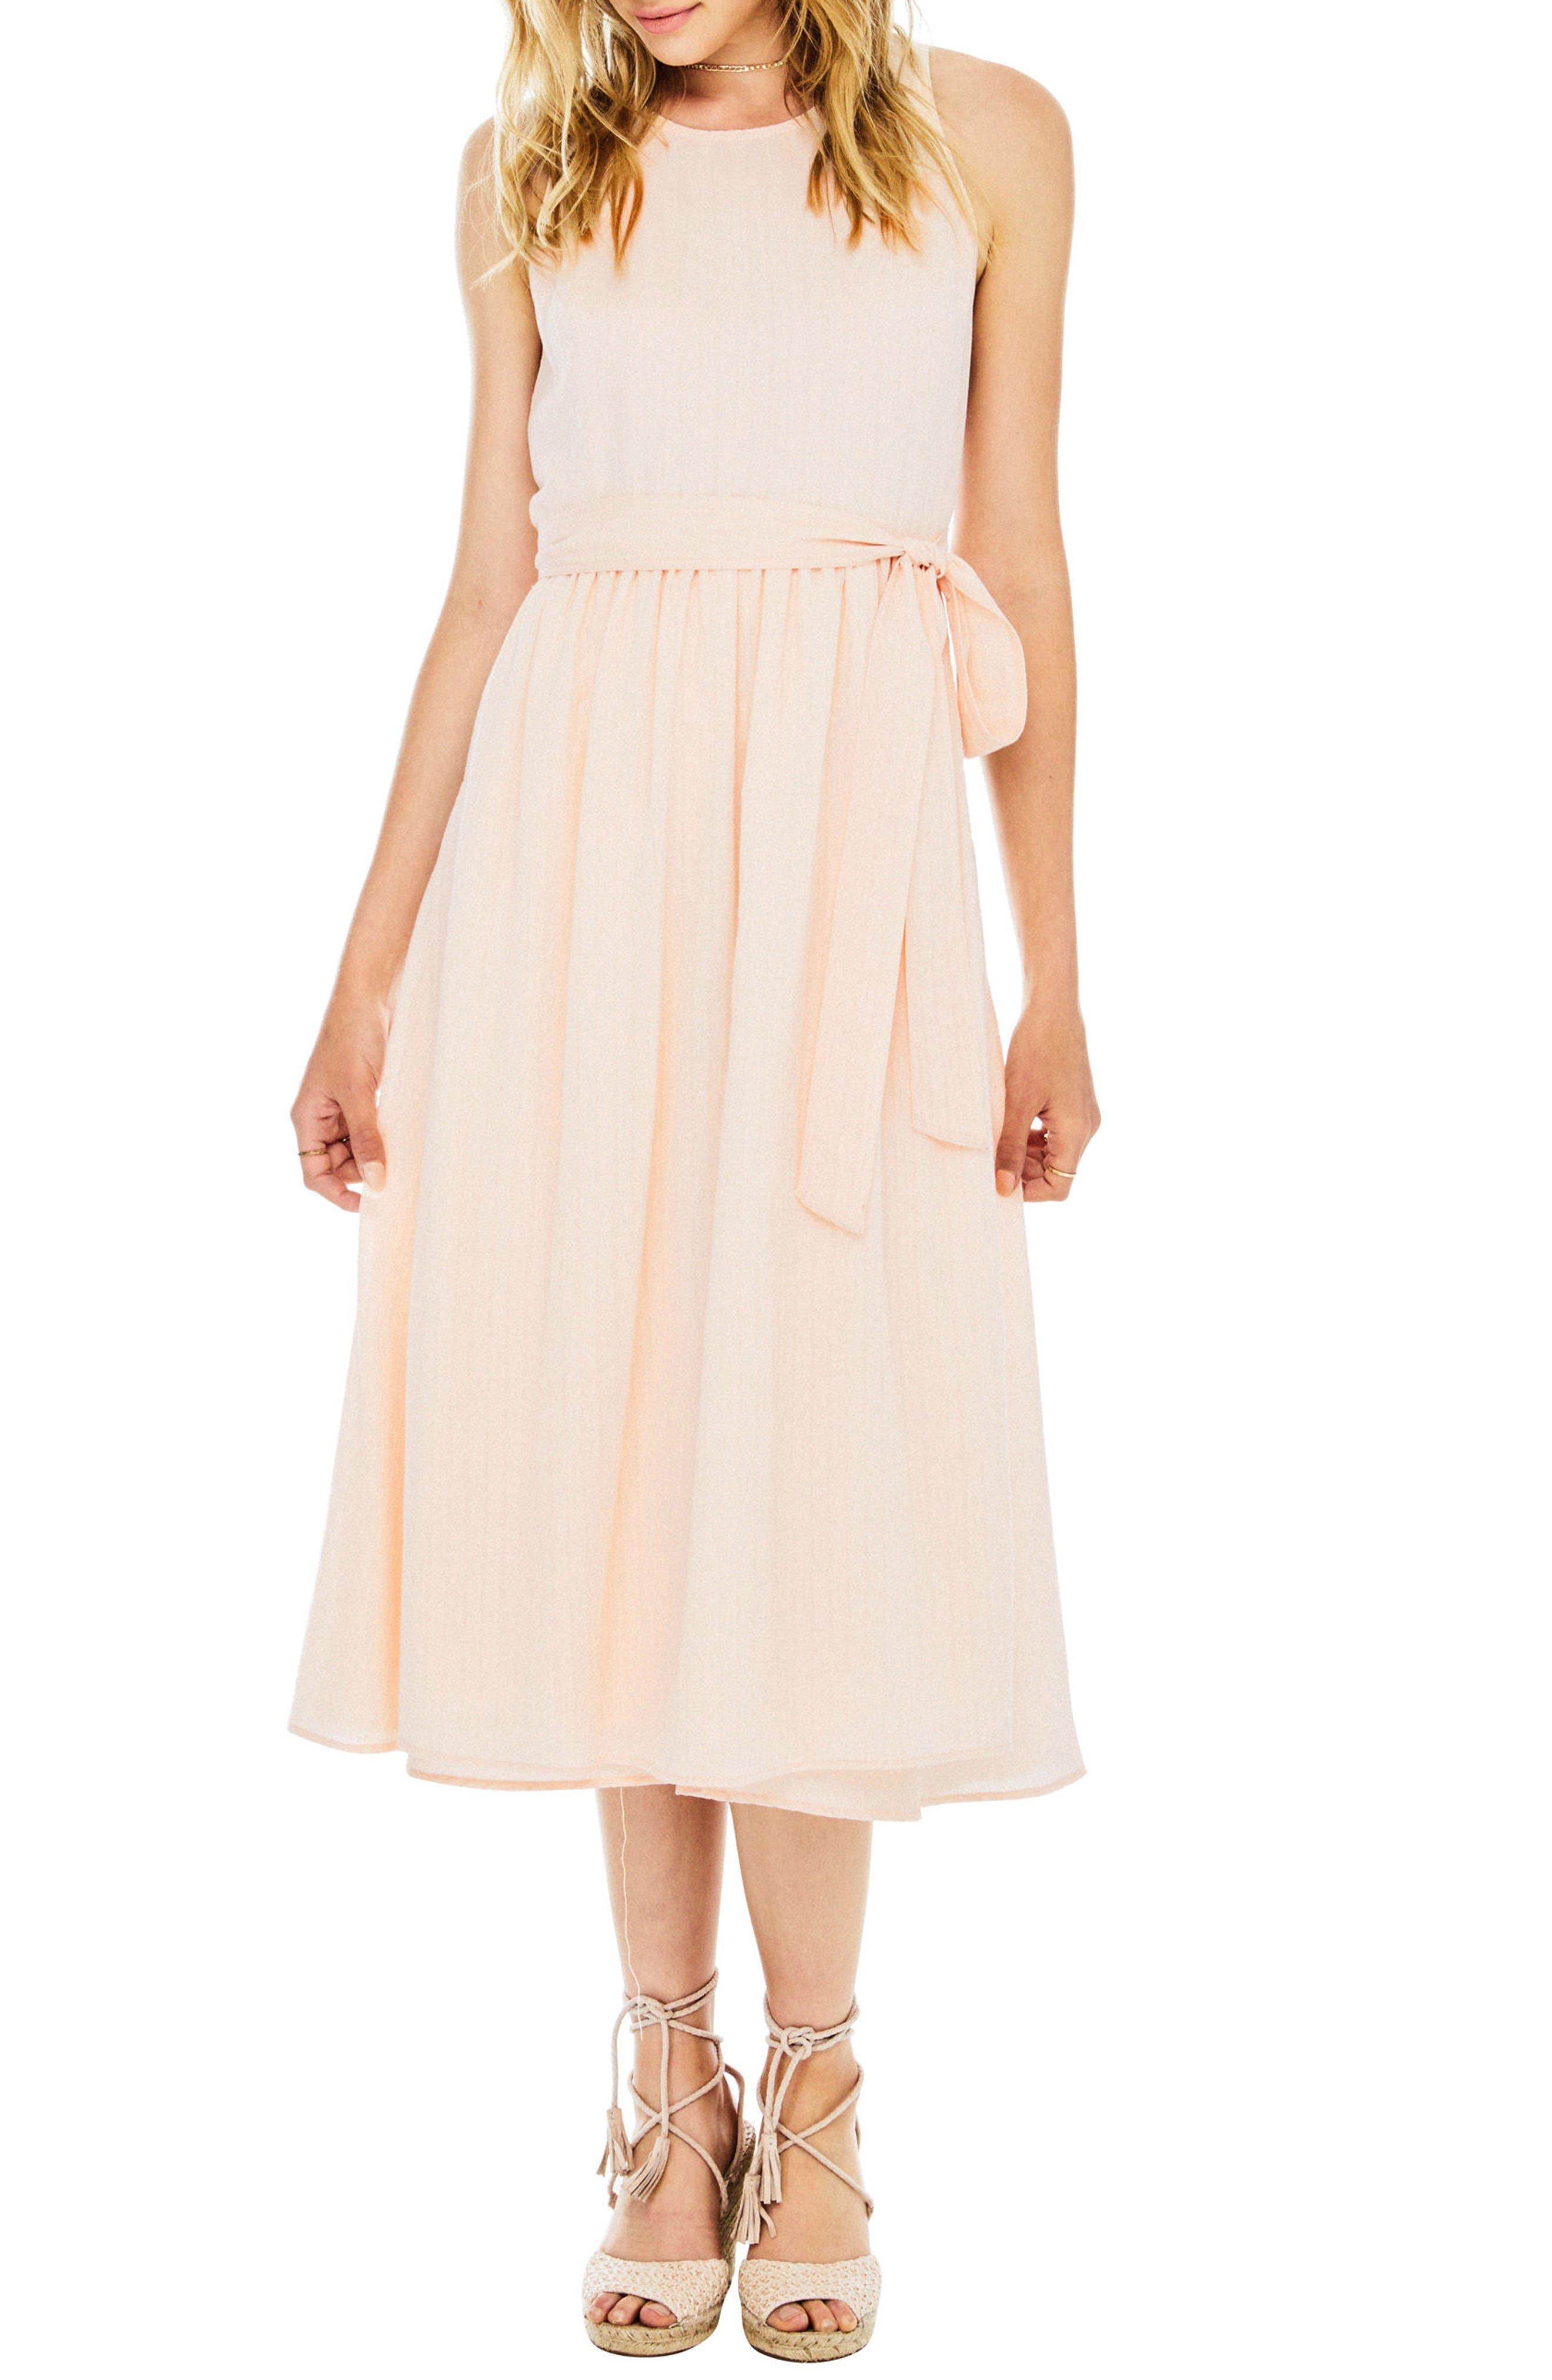 Brady Dress,                         Main,                         color, Powder Pink